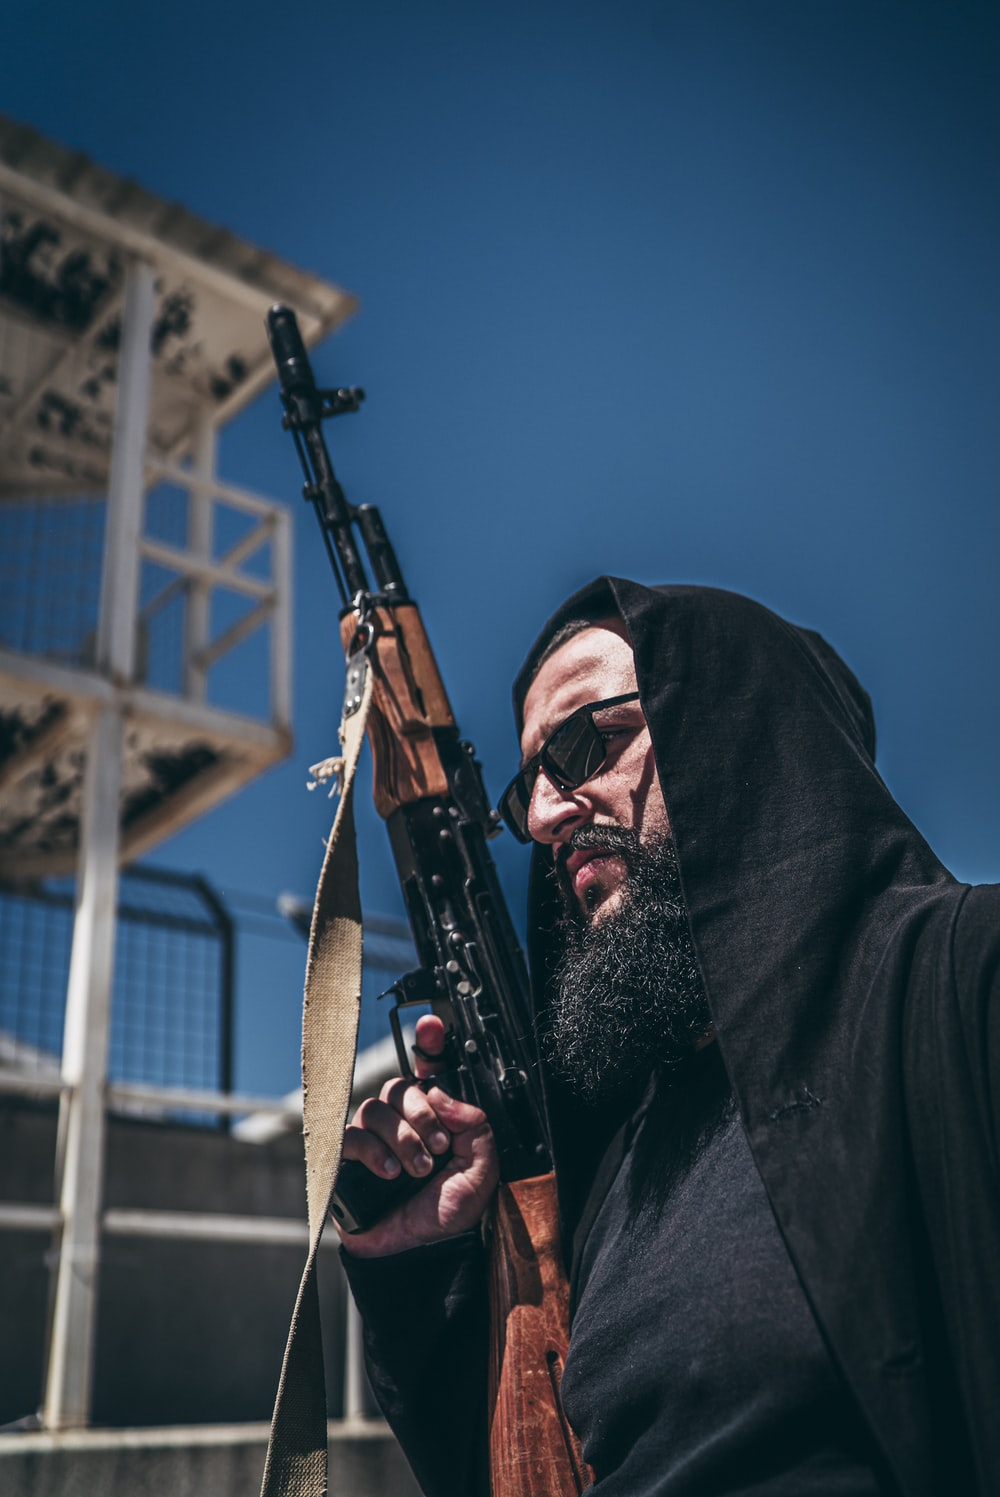 man in black coat holding black rifle